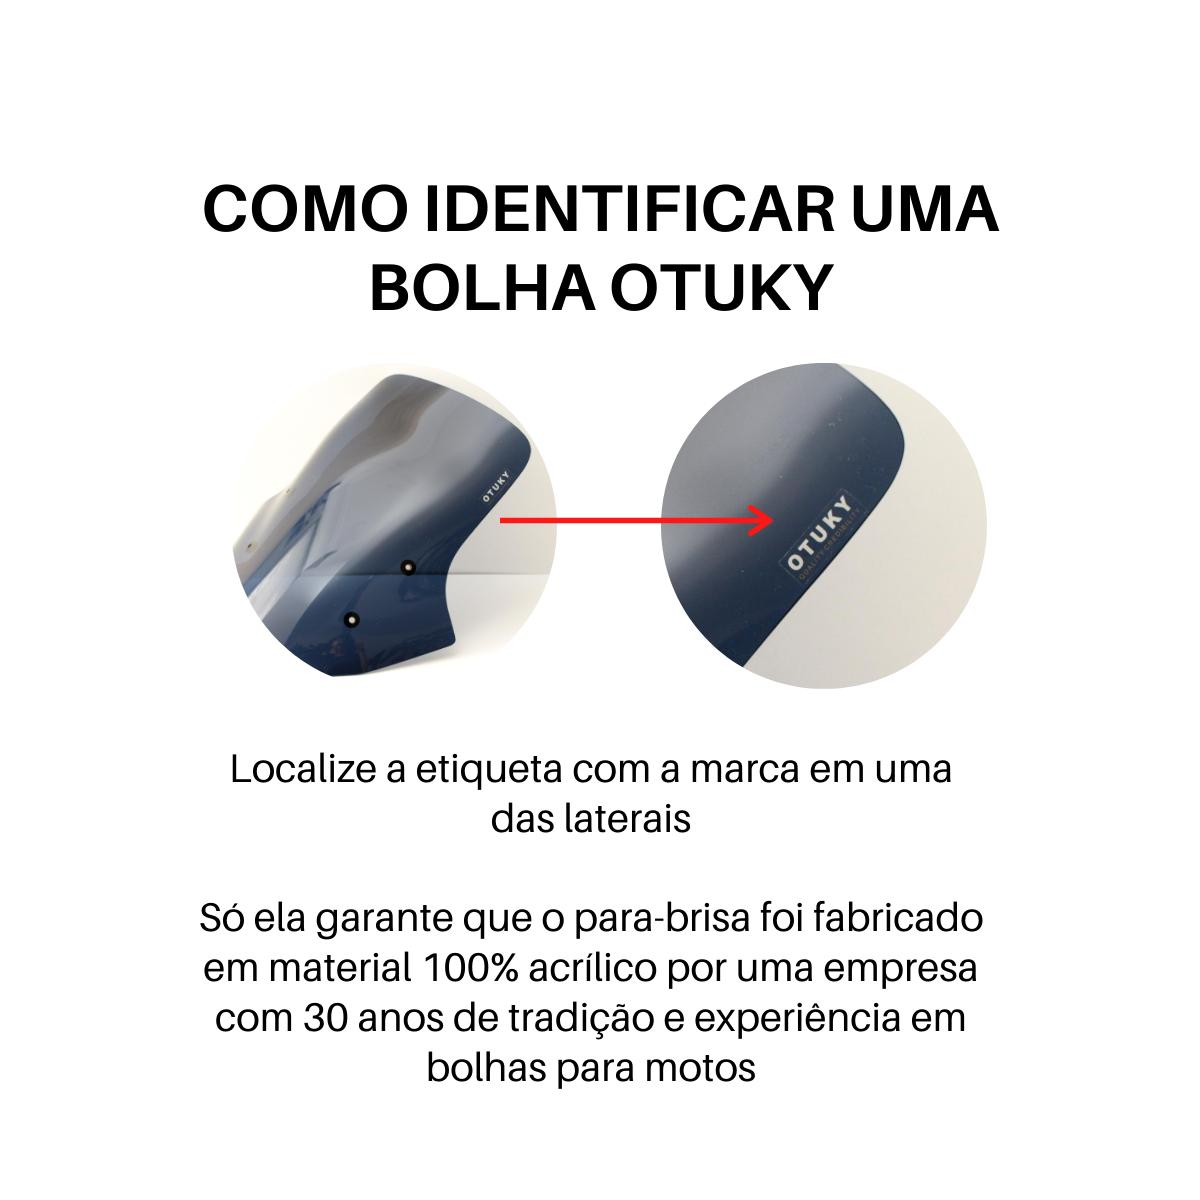 Bolha para Moto XT 660 R 2005 até 2018 Otuky Alongada Fumê Cinza